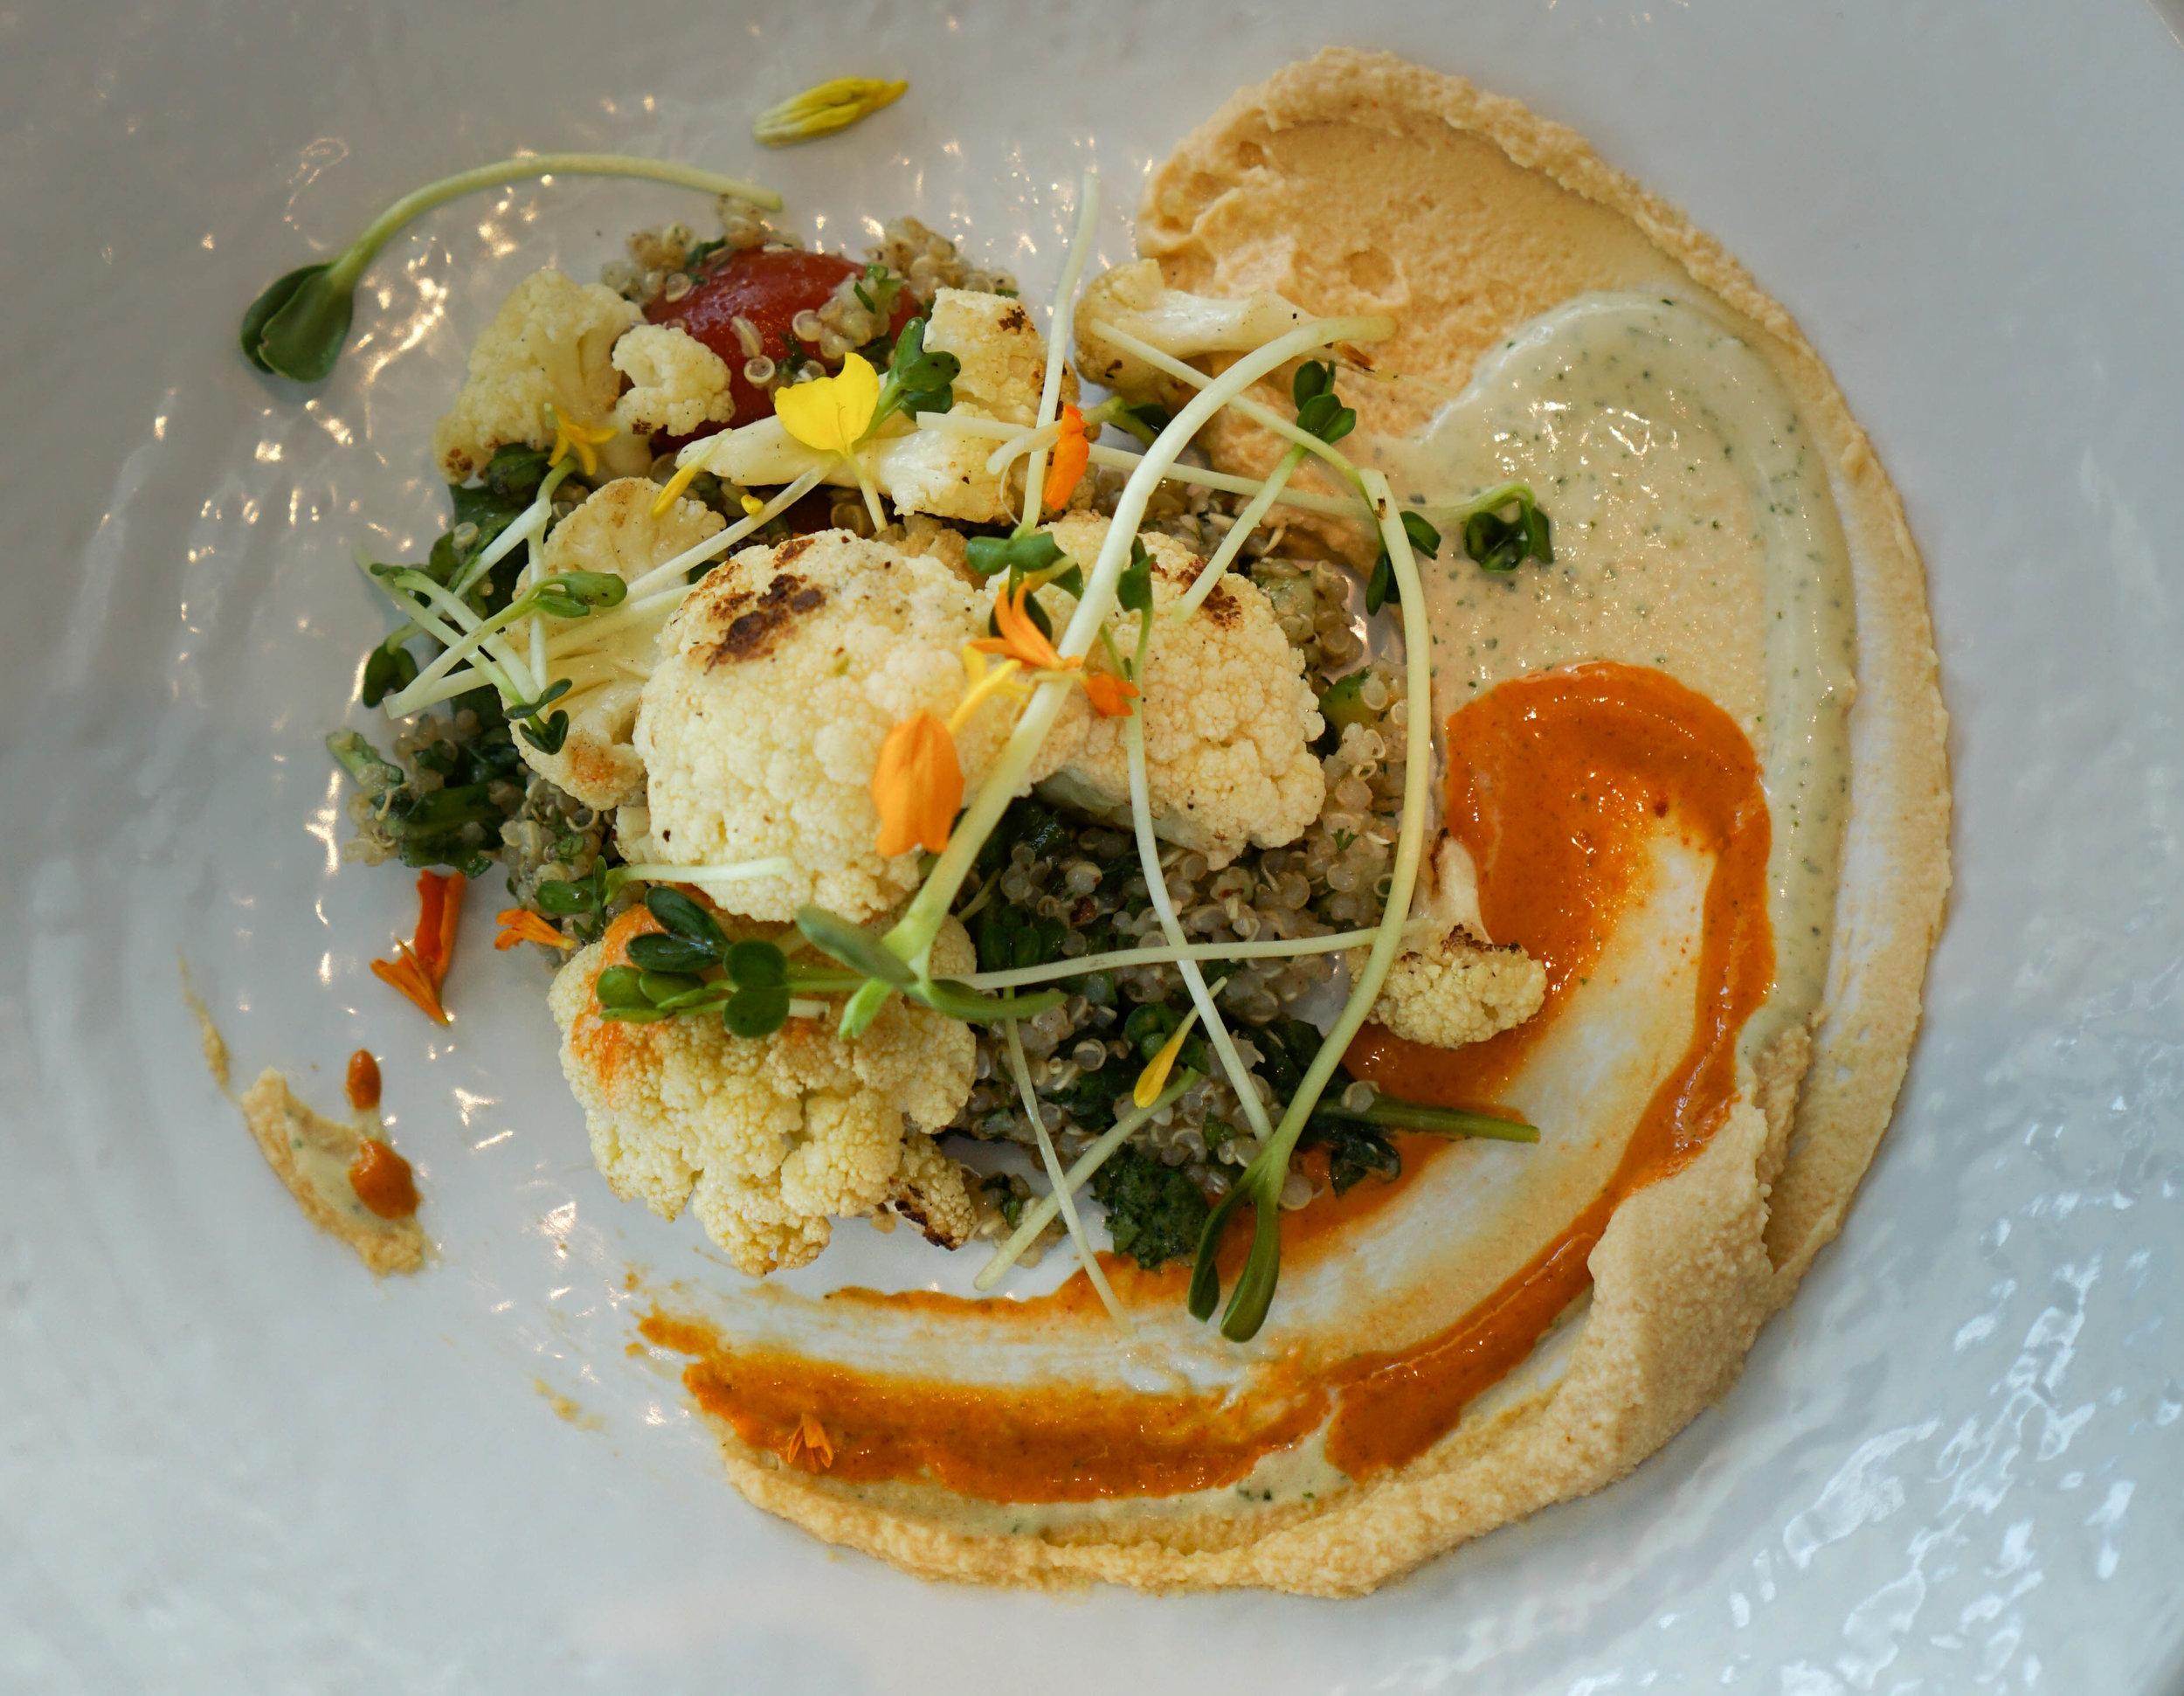 Plnthouse 1 Hotel Cauliflower Quinoa Bowl